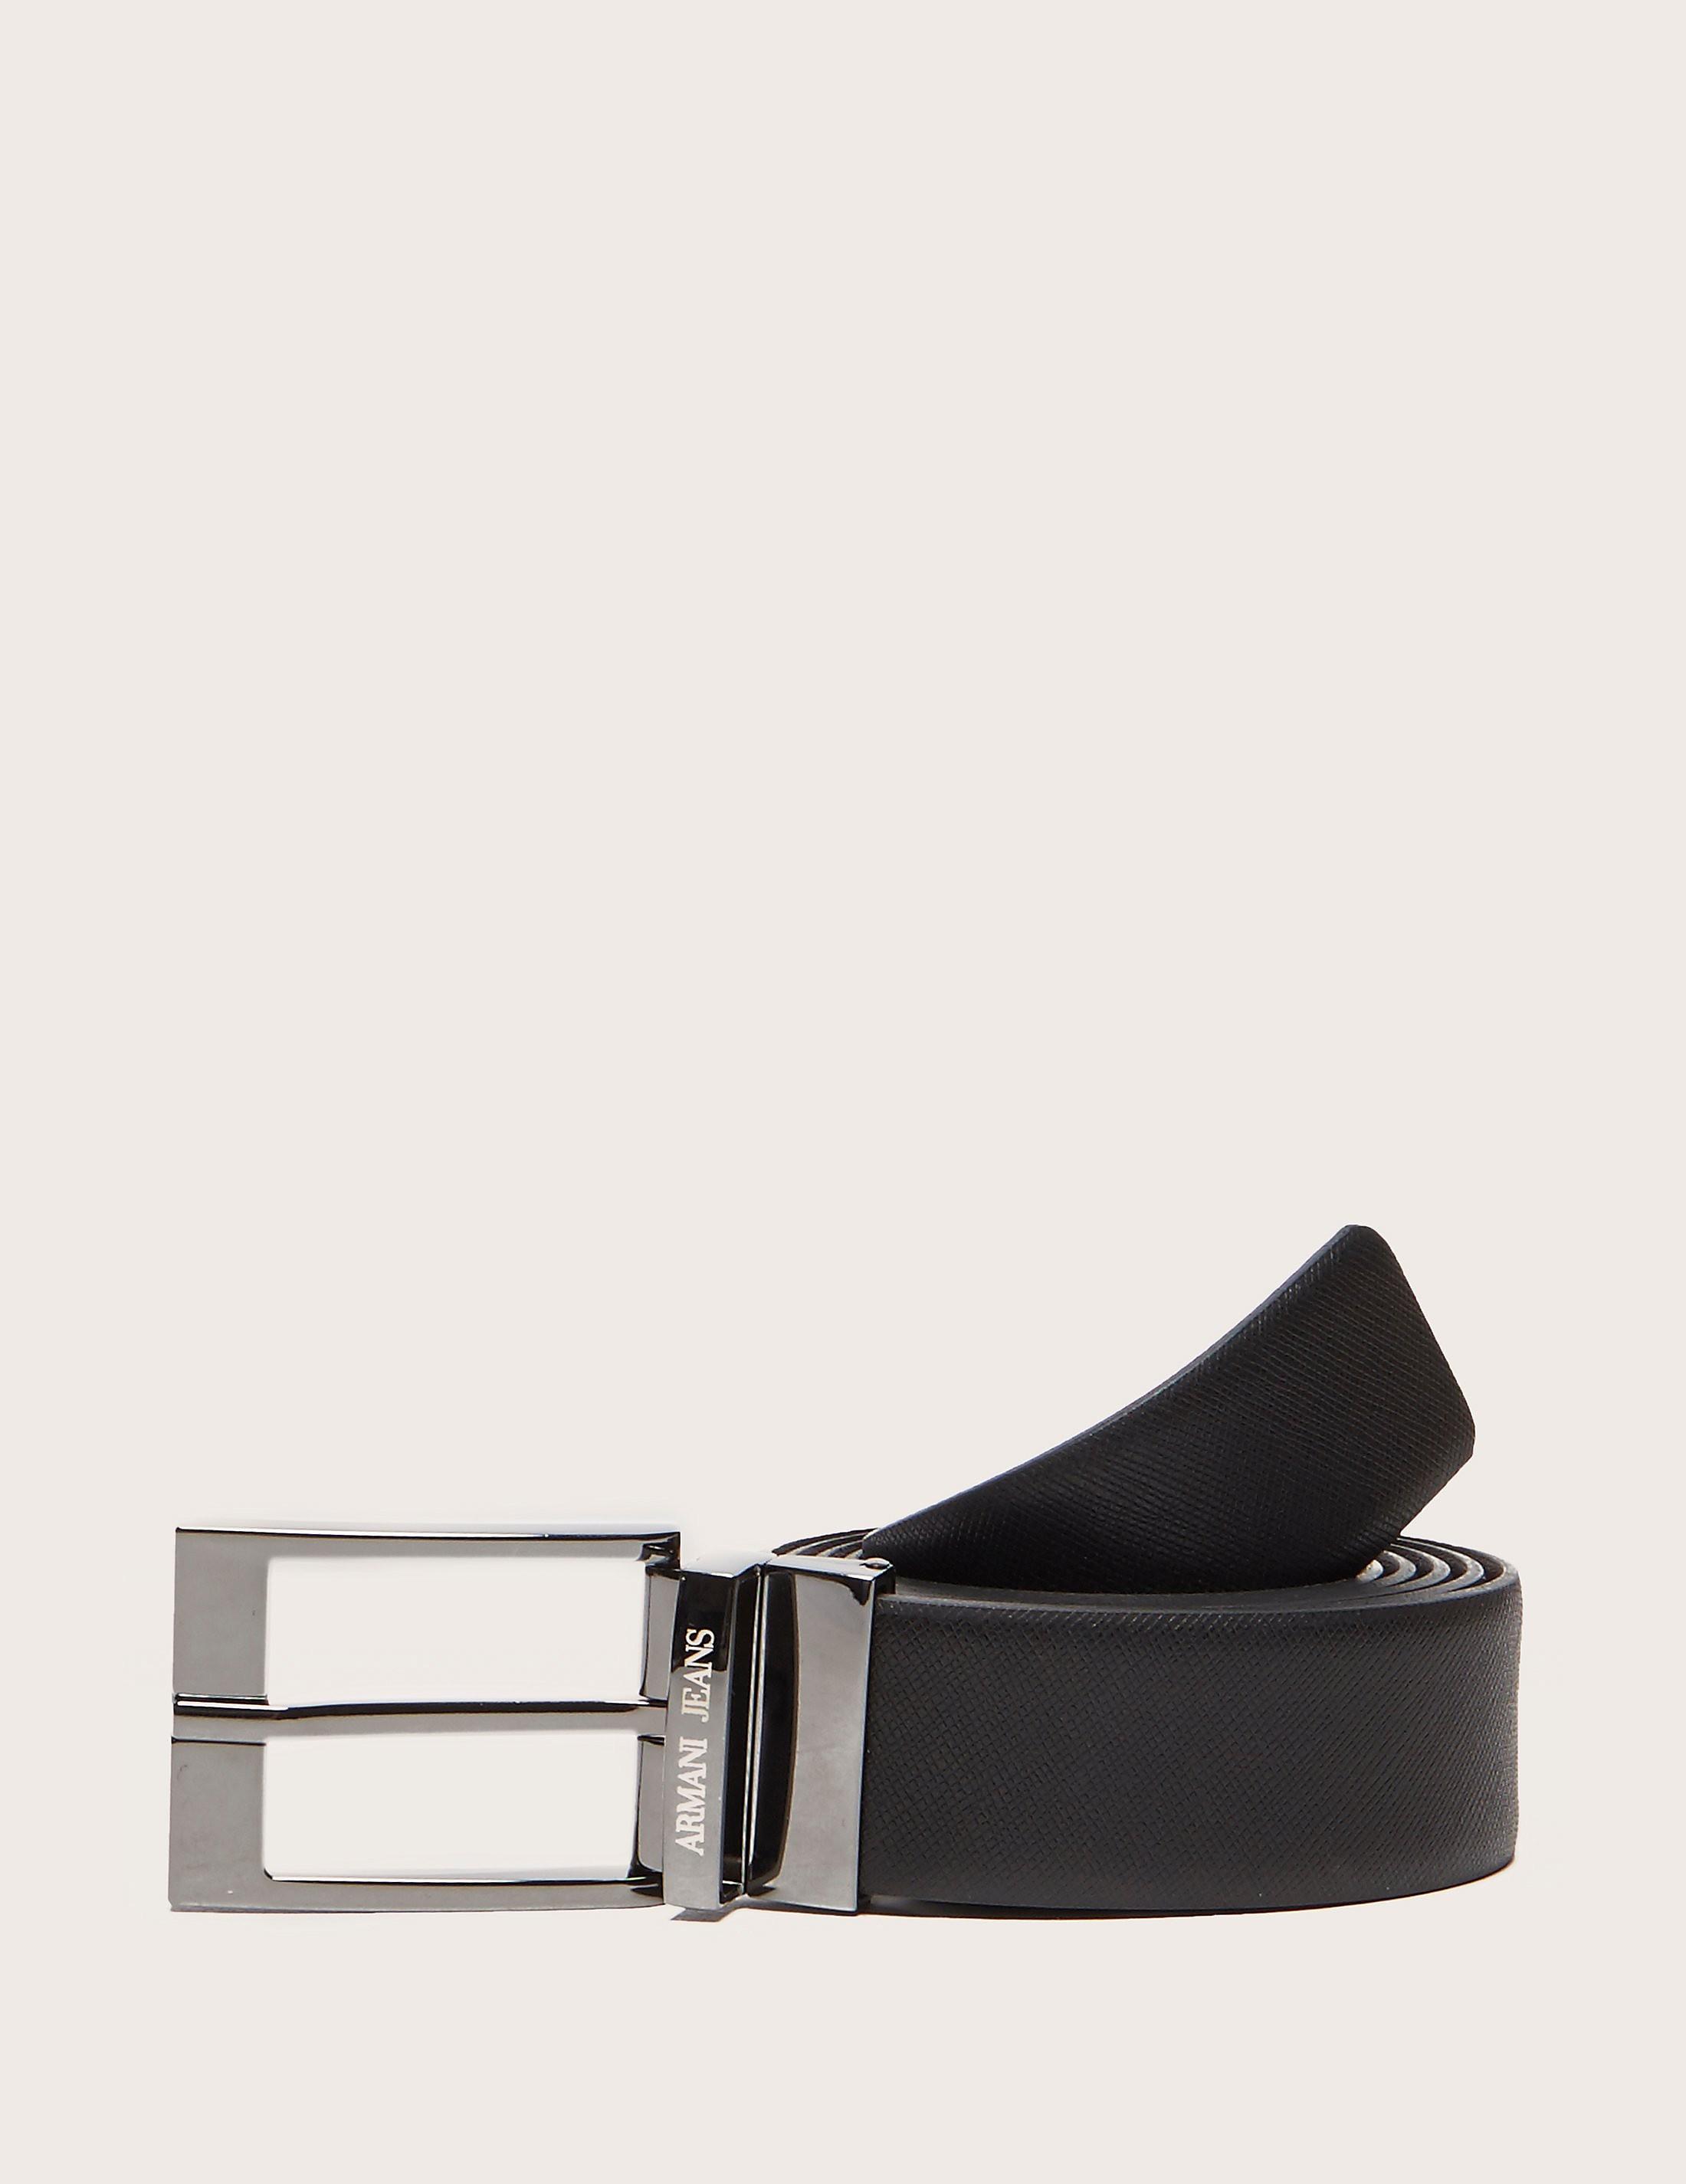 Armani Jeans Textured Belt